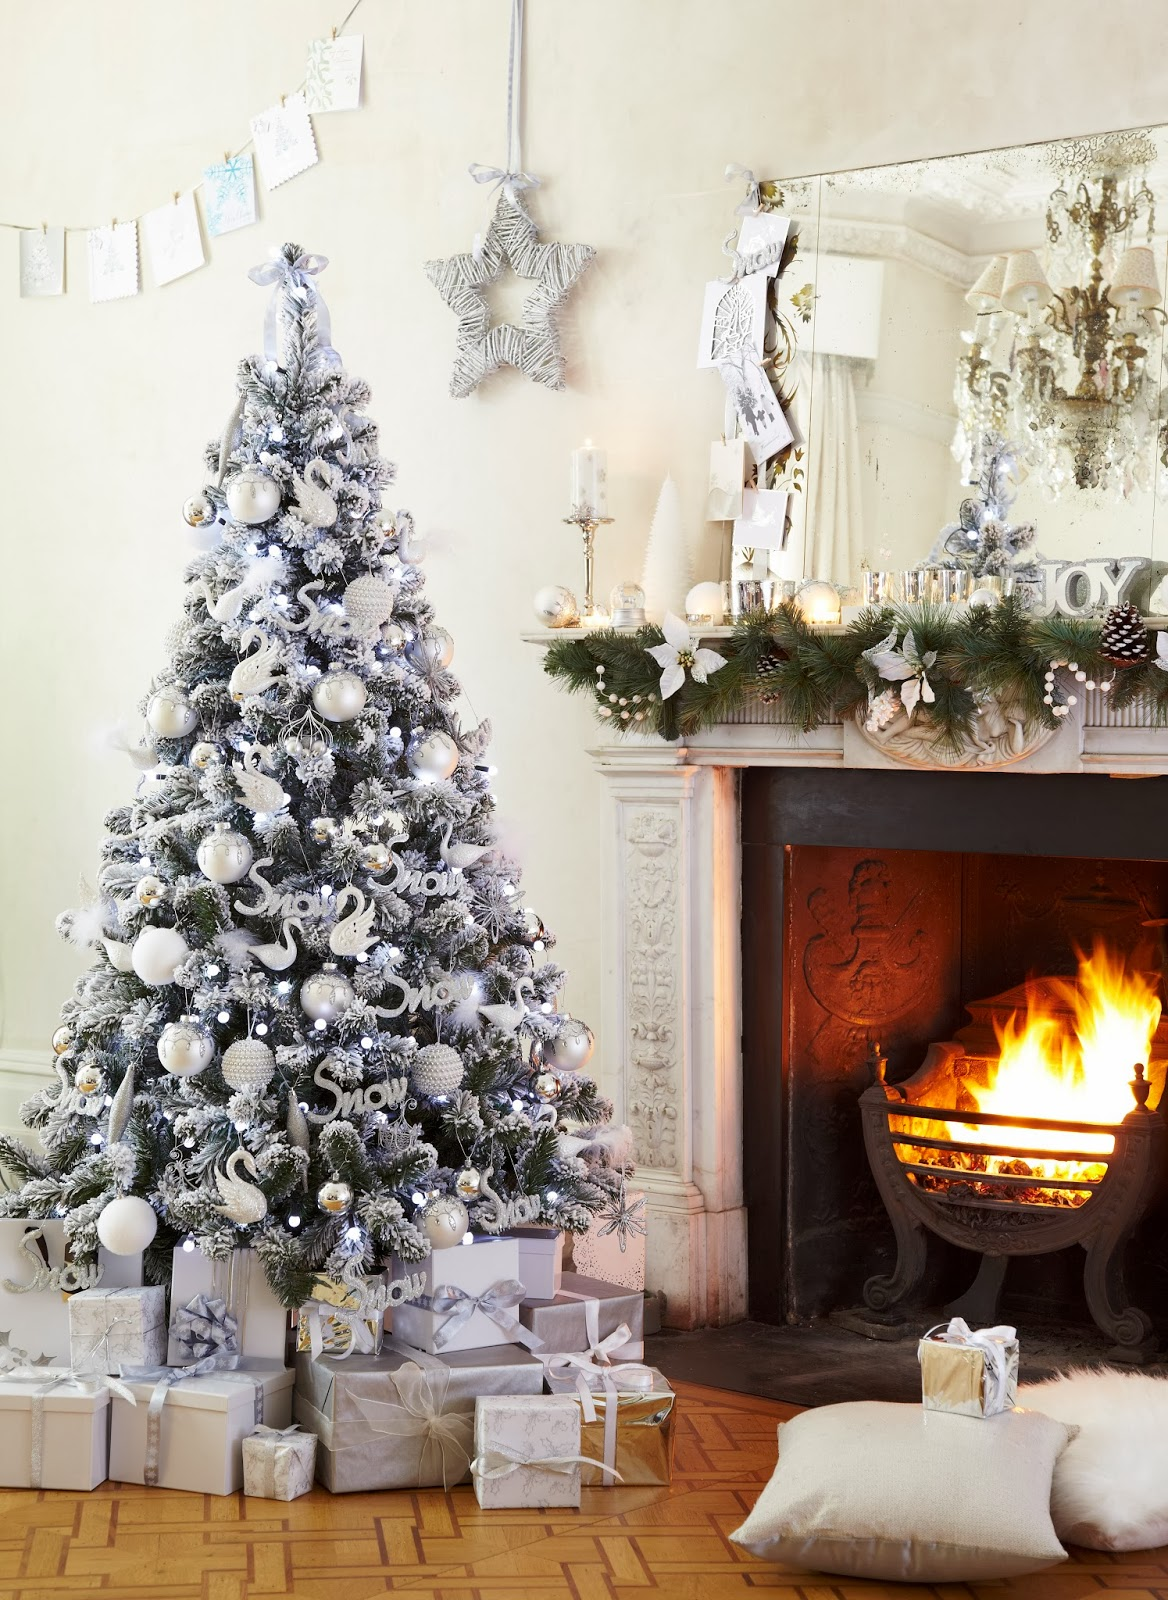 Delightful Tesco Direct Christmas Decorations Part - 14: Tesco Christmas 2013